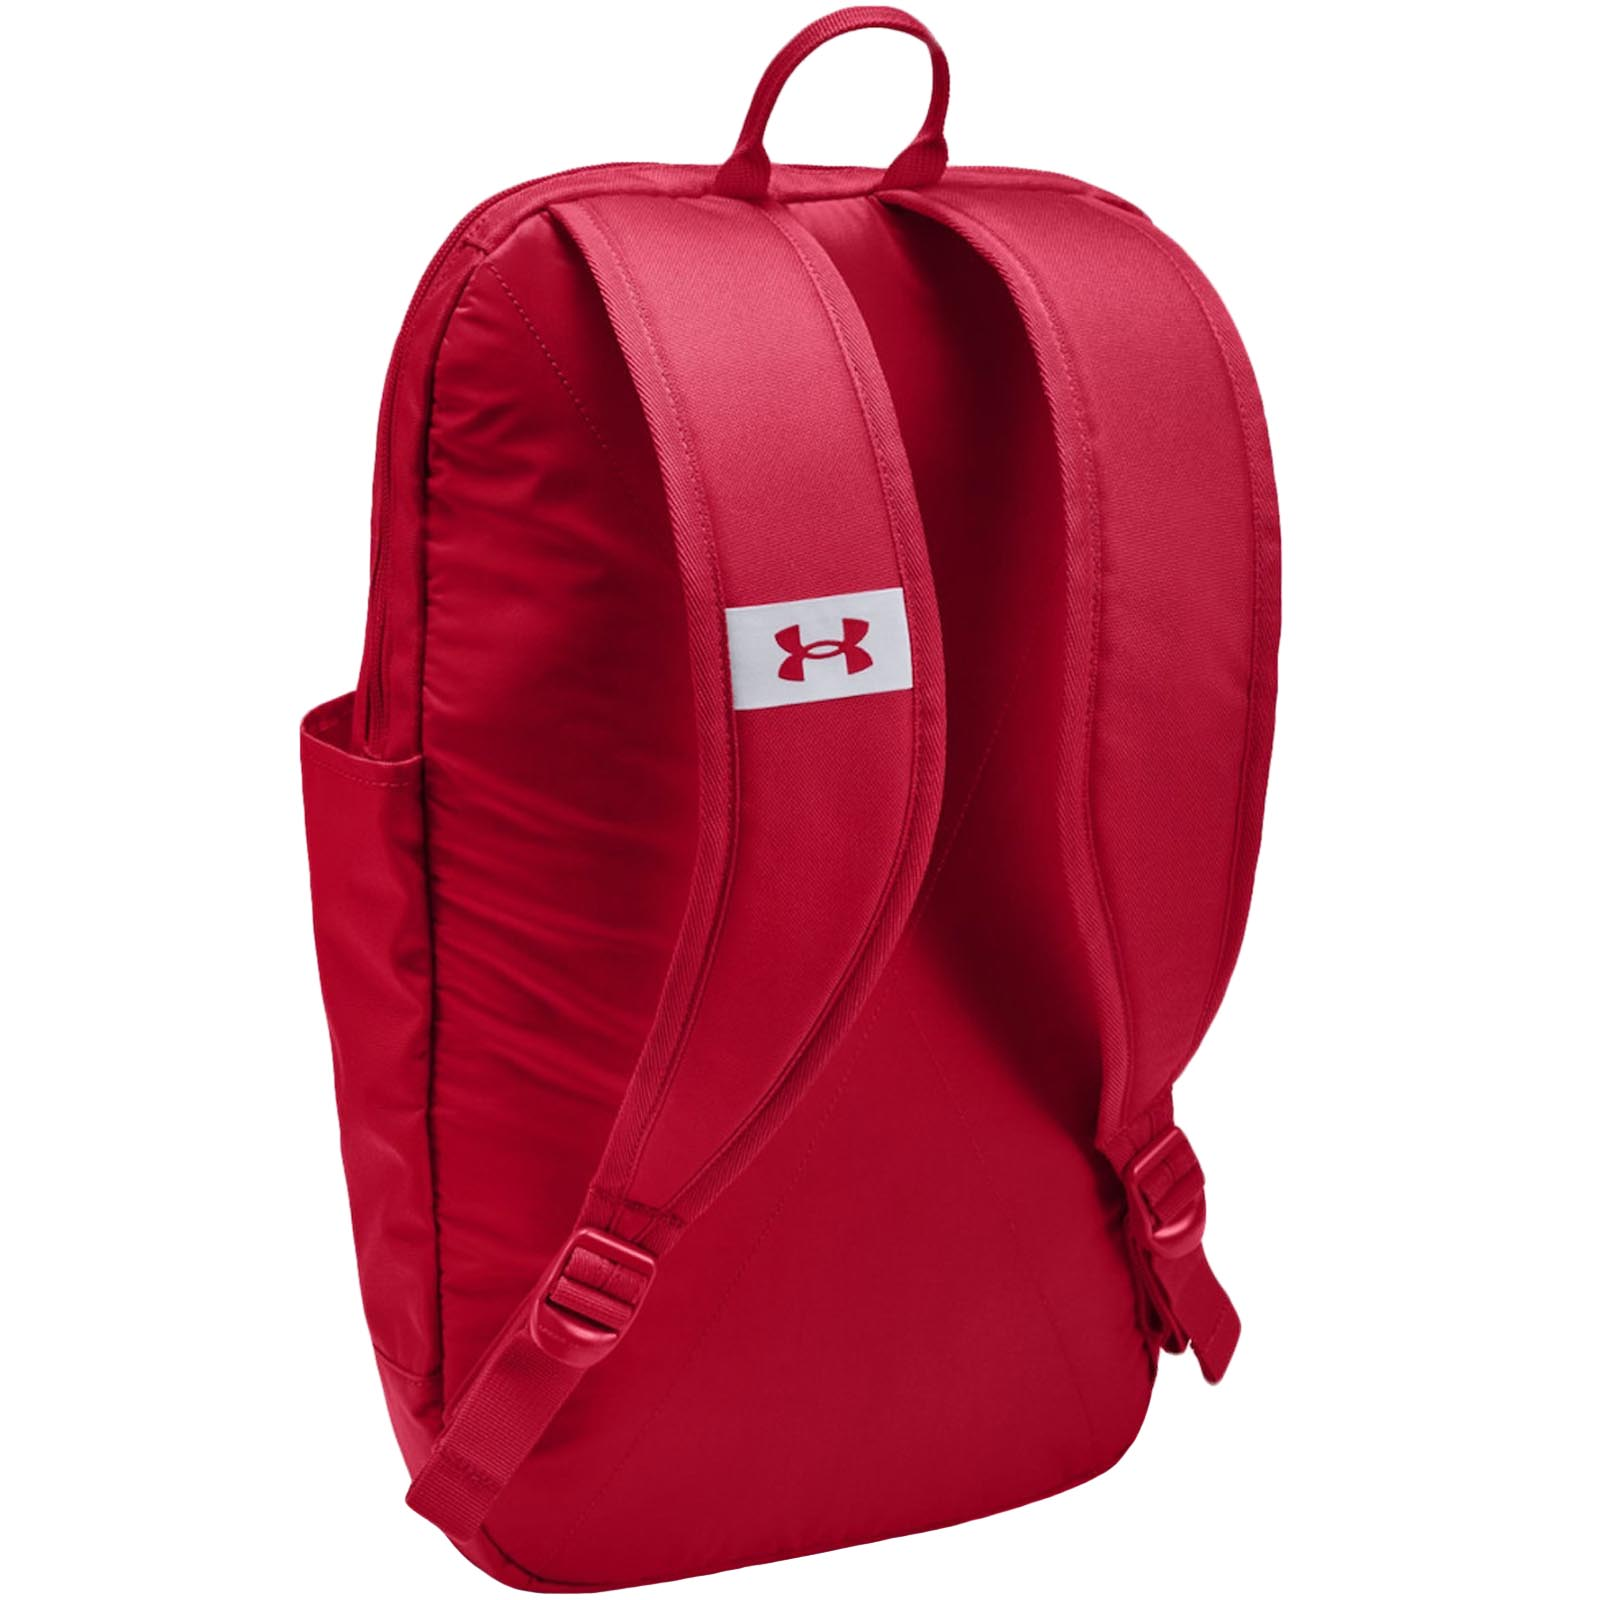 Under-Armour-UA-Unisex-Patterson-Rucksack-Bag-Backpack thumbnail 9